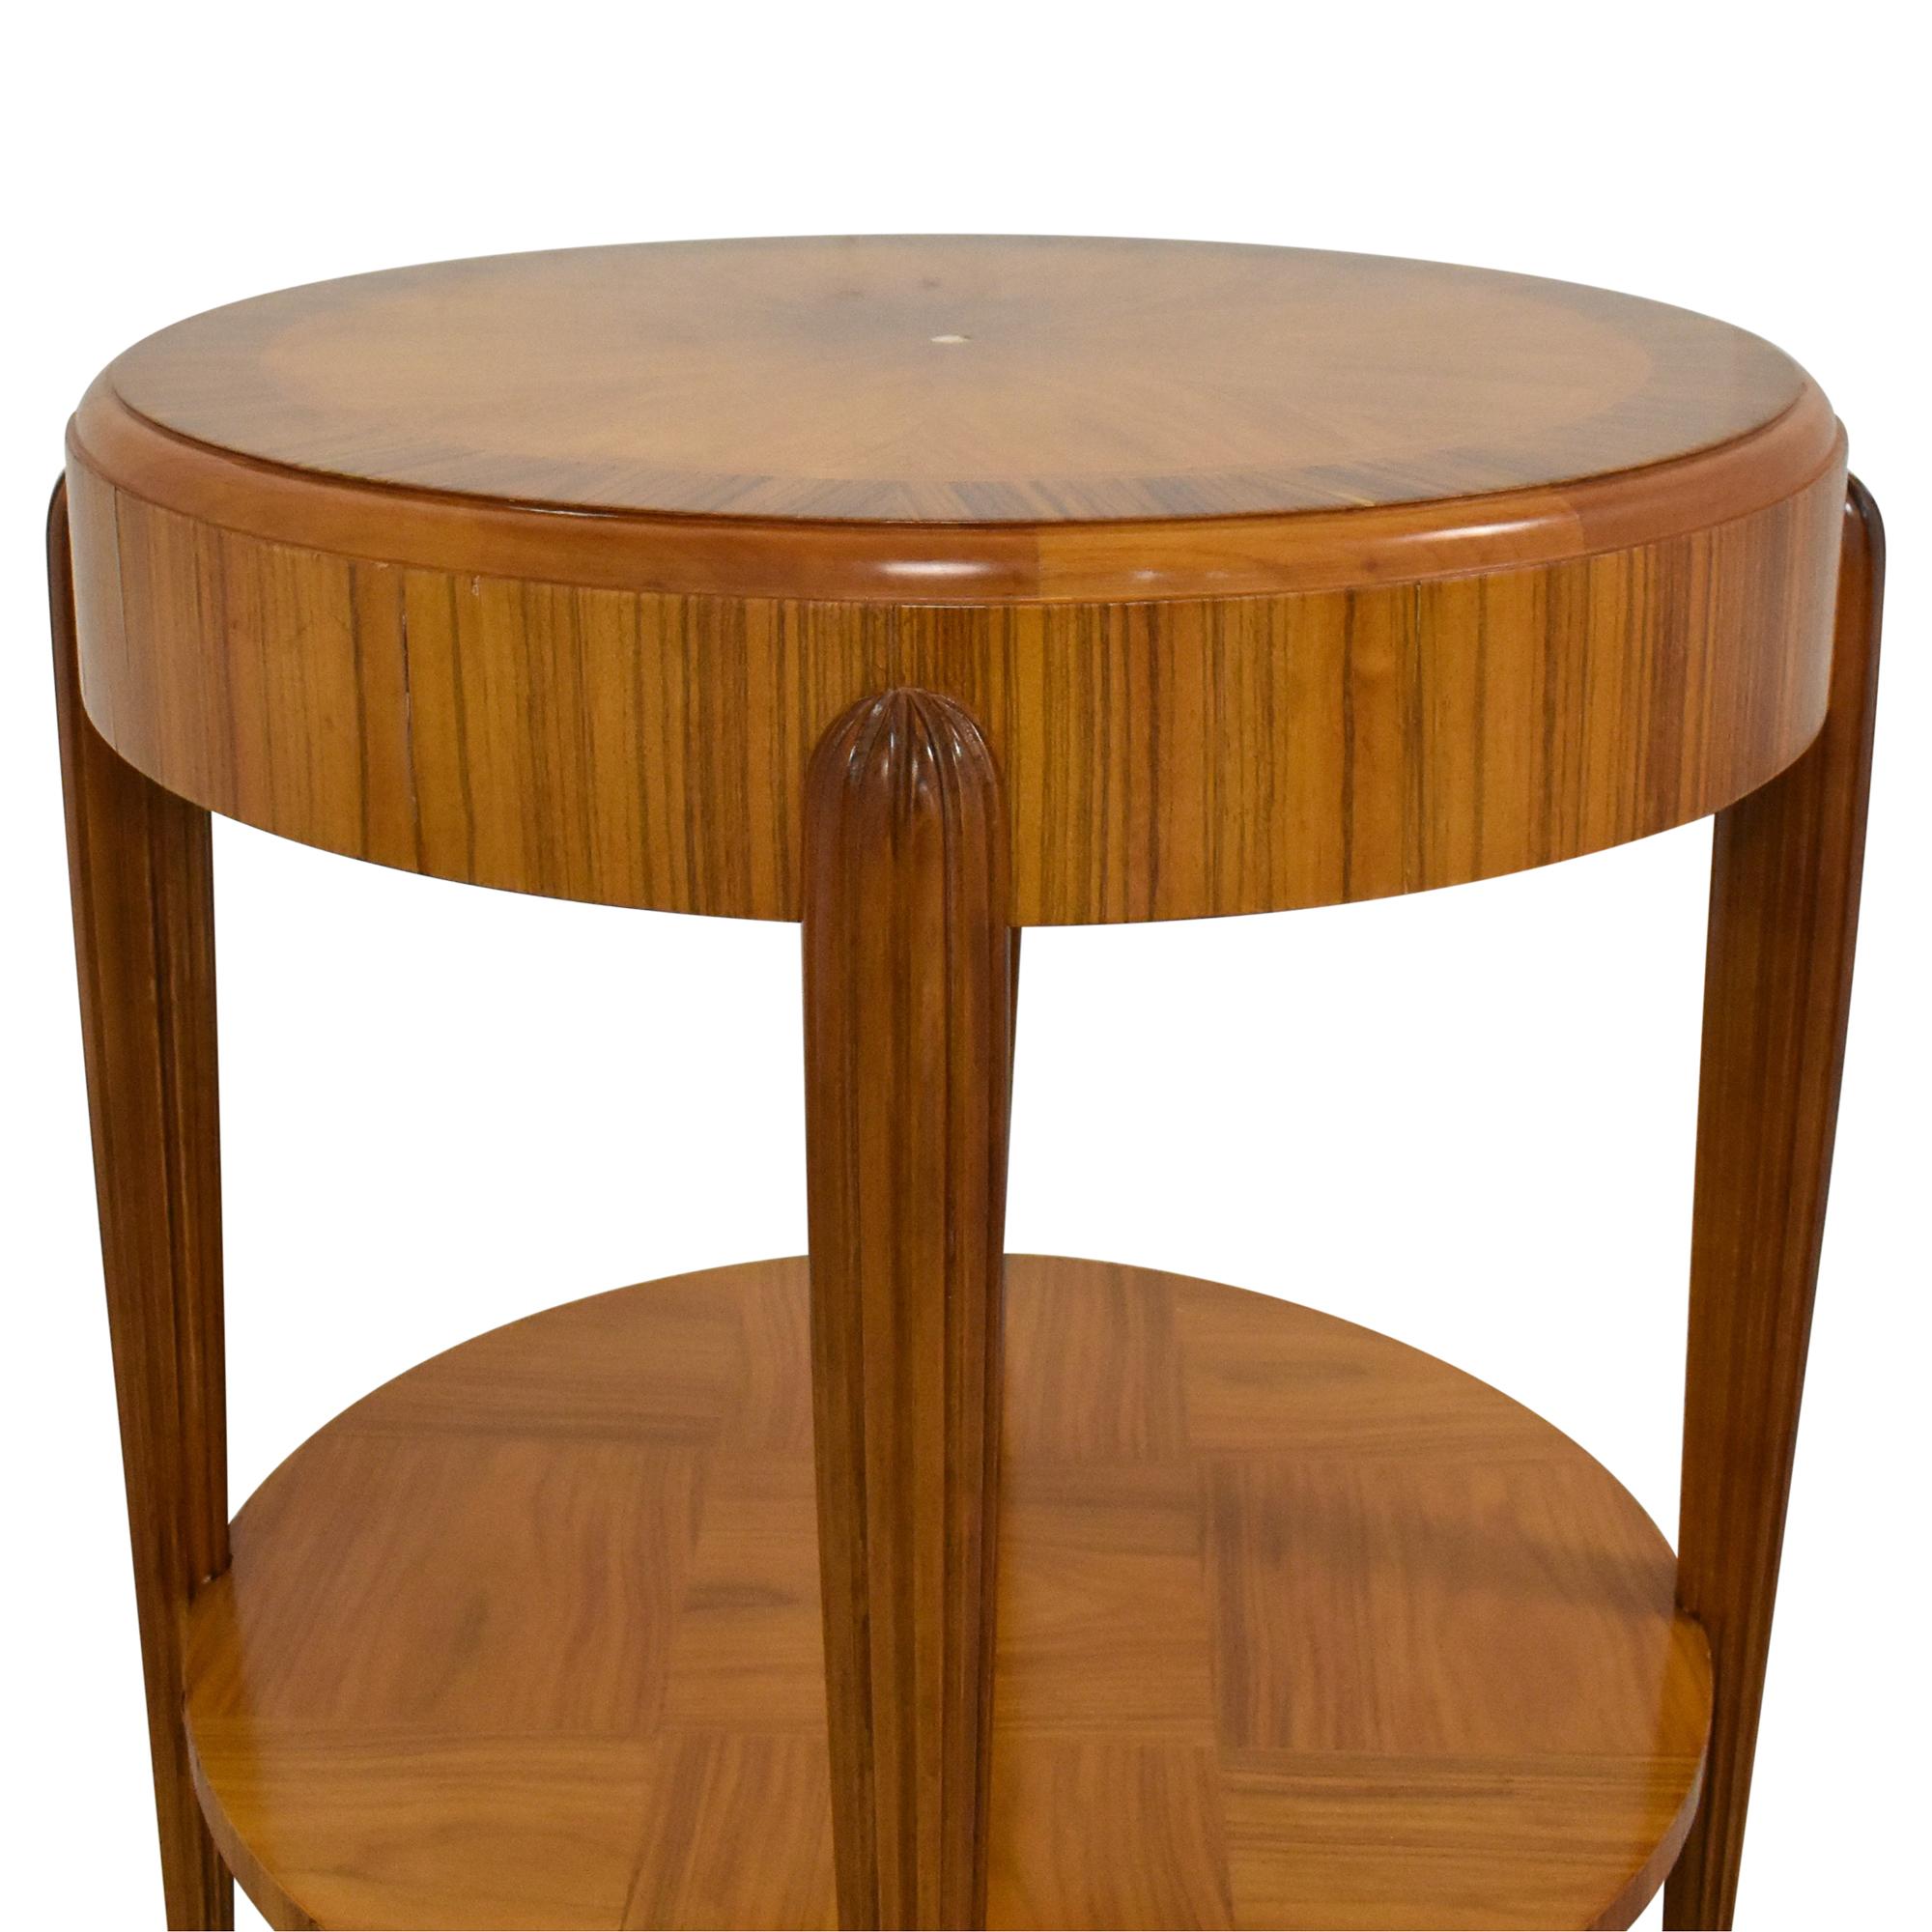 Round Art Deco Side Table nj